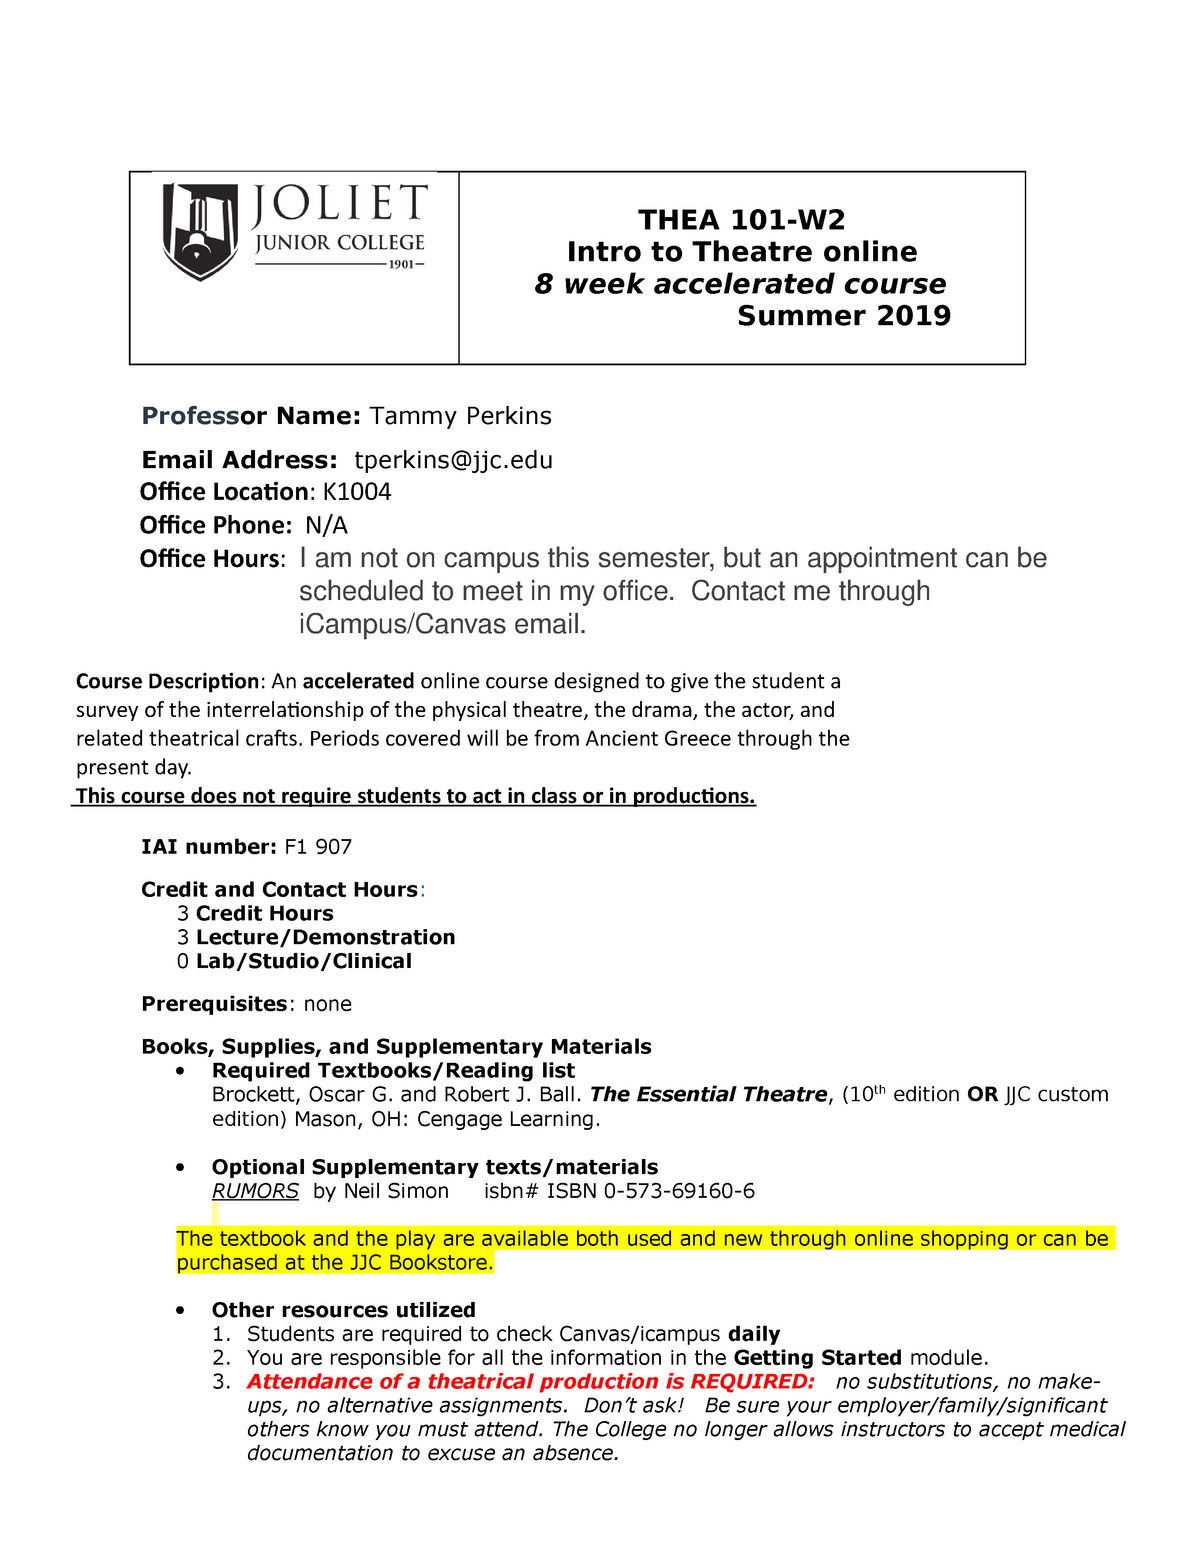 Thea101-W2 syllabus Summer 2019 - ENGLI 2105 - DuPage - StuDocu